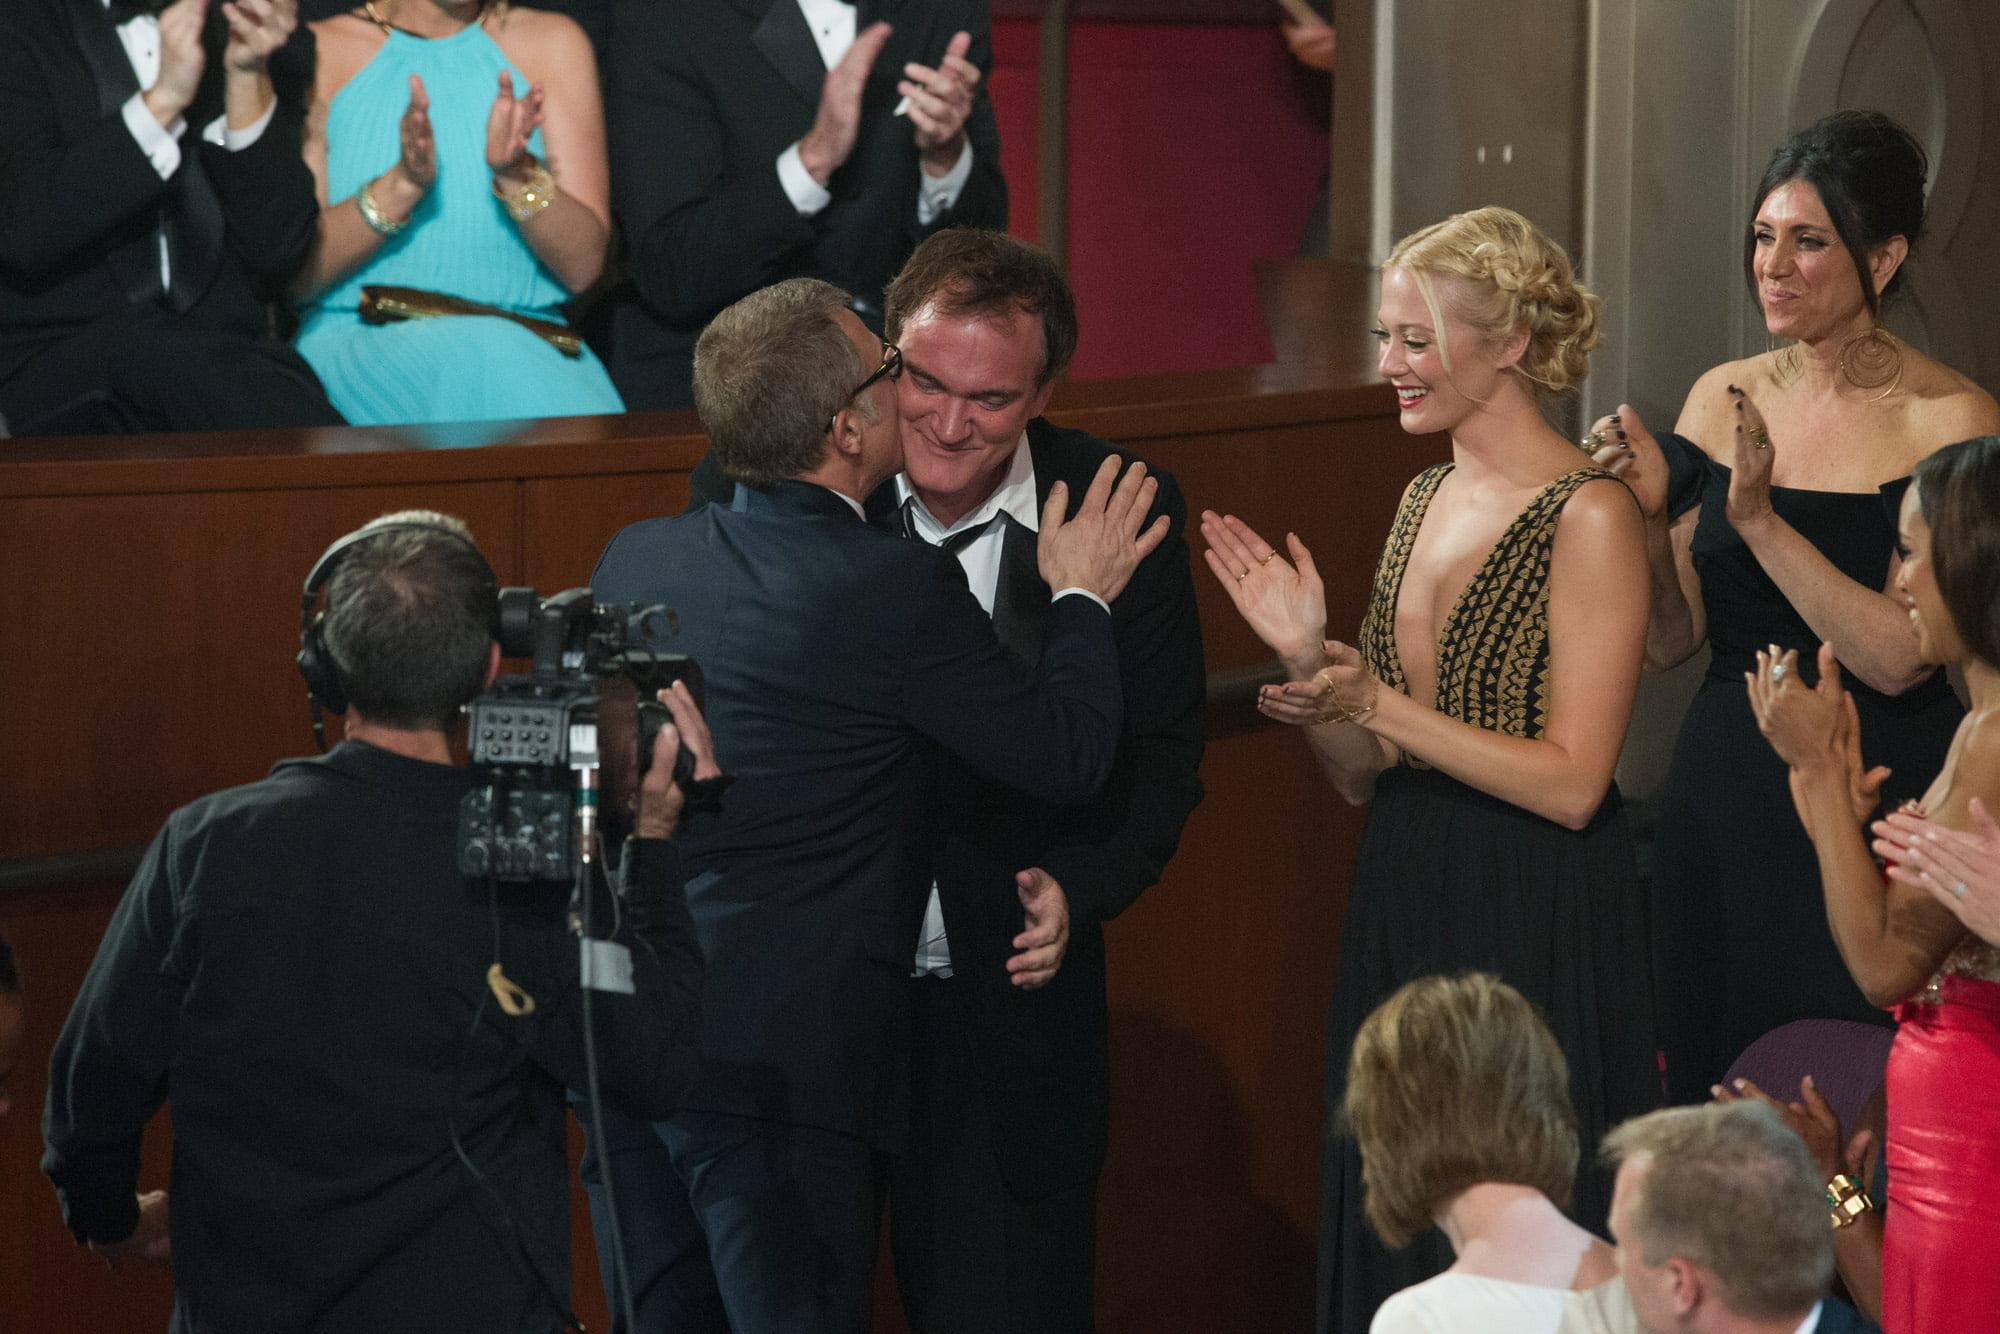 Christoph Waltz and Quentin Tarantino